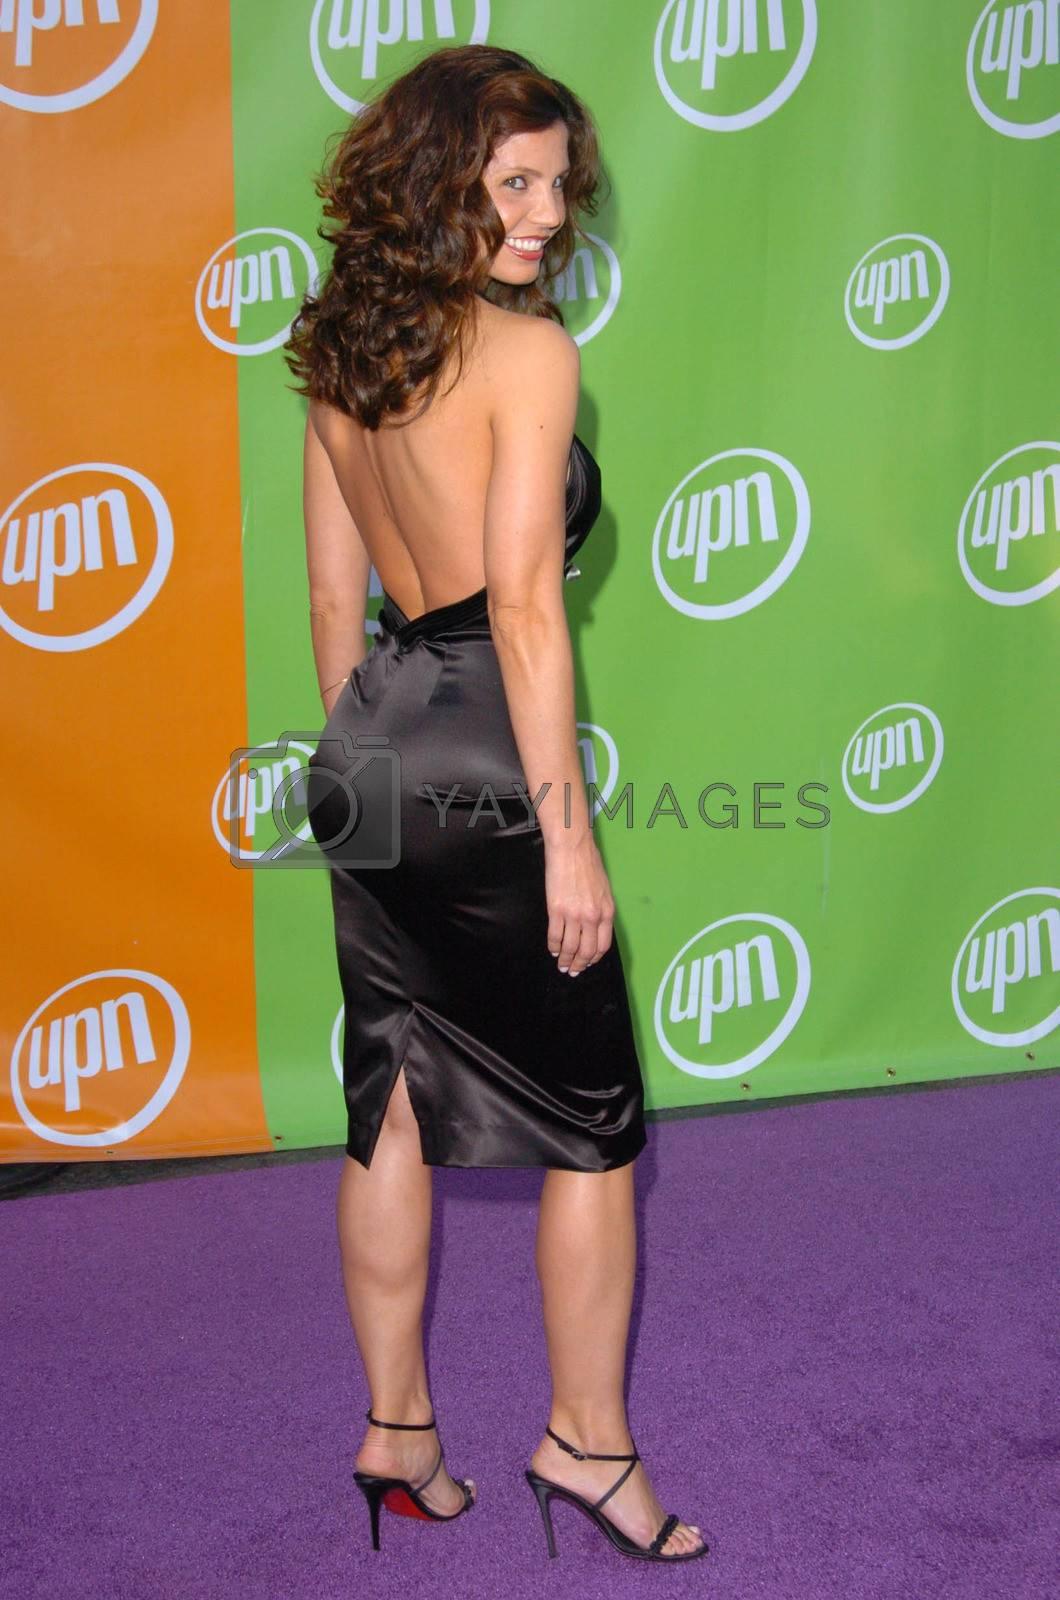 Charisma Carpenter At the UPN Summer TCA Party, Paramount Studios, Hollywood, CA 07-21-05